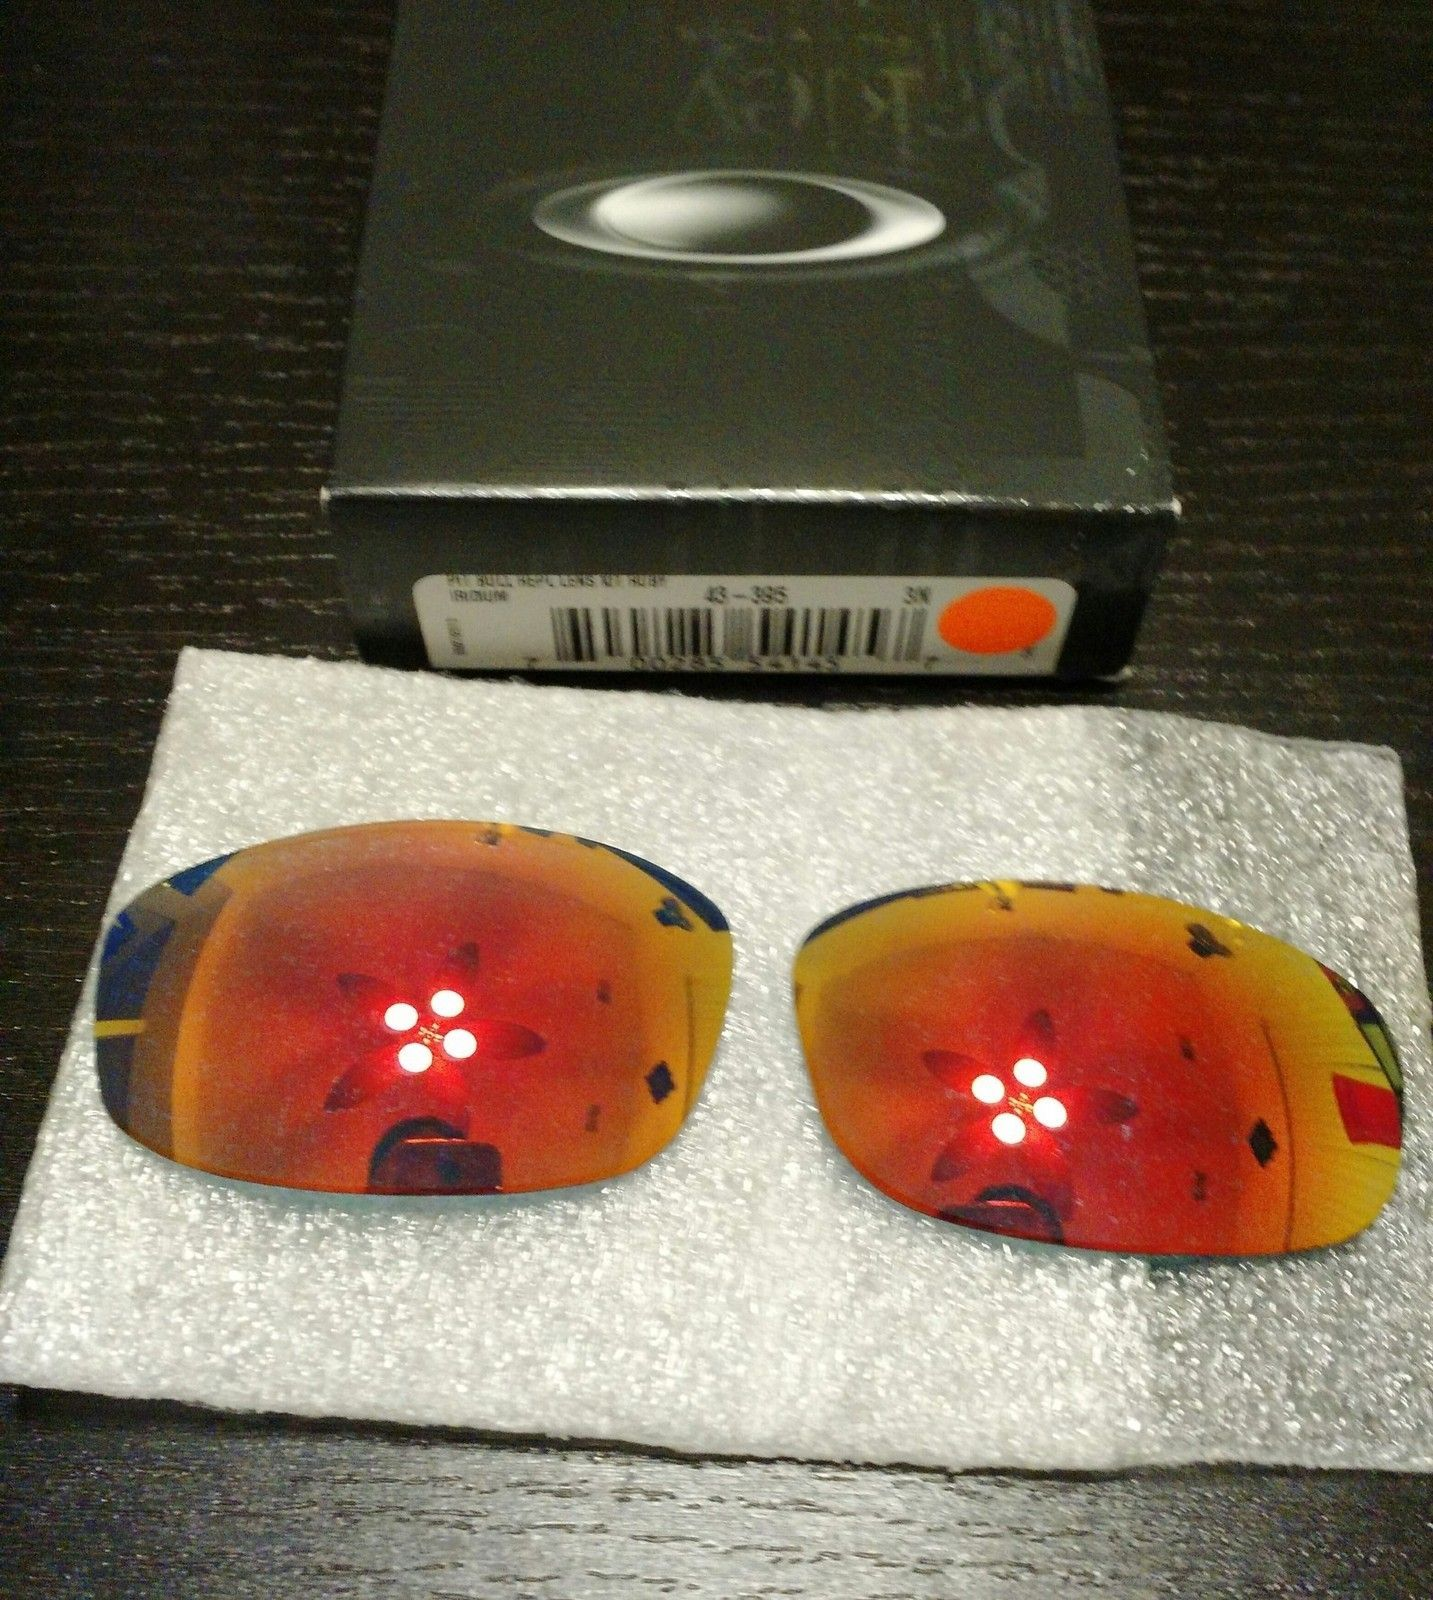 PB1 custom ruby lense and PB2 Black Polarized - uploadfromtaptalk1416879828403.jpg